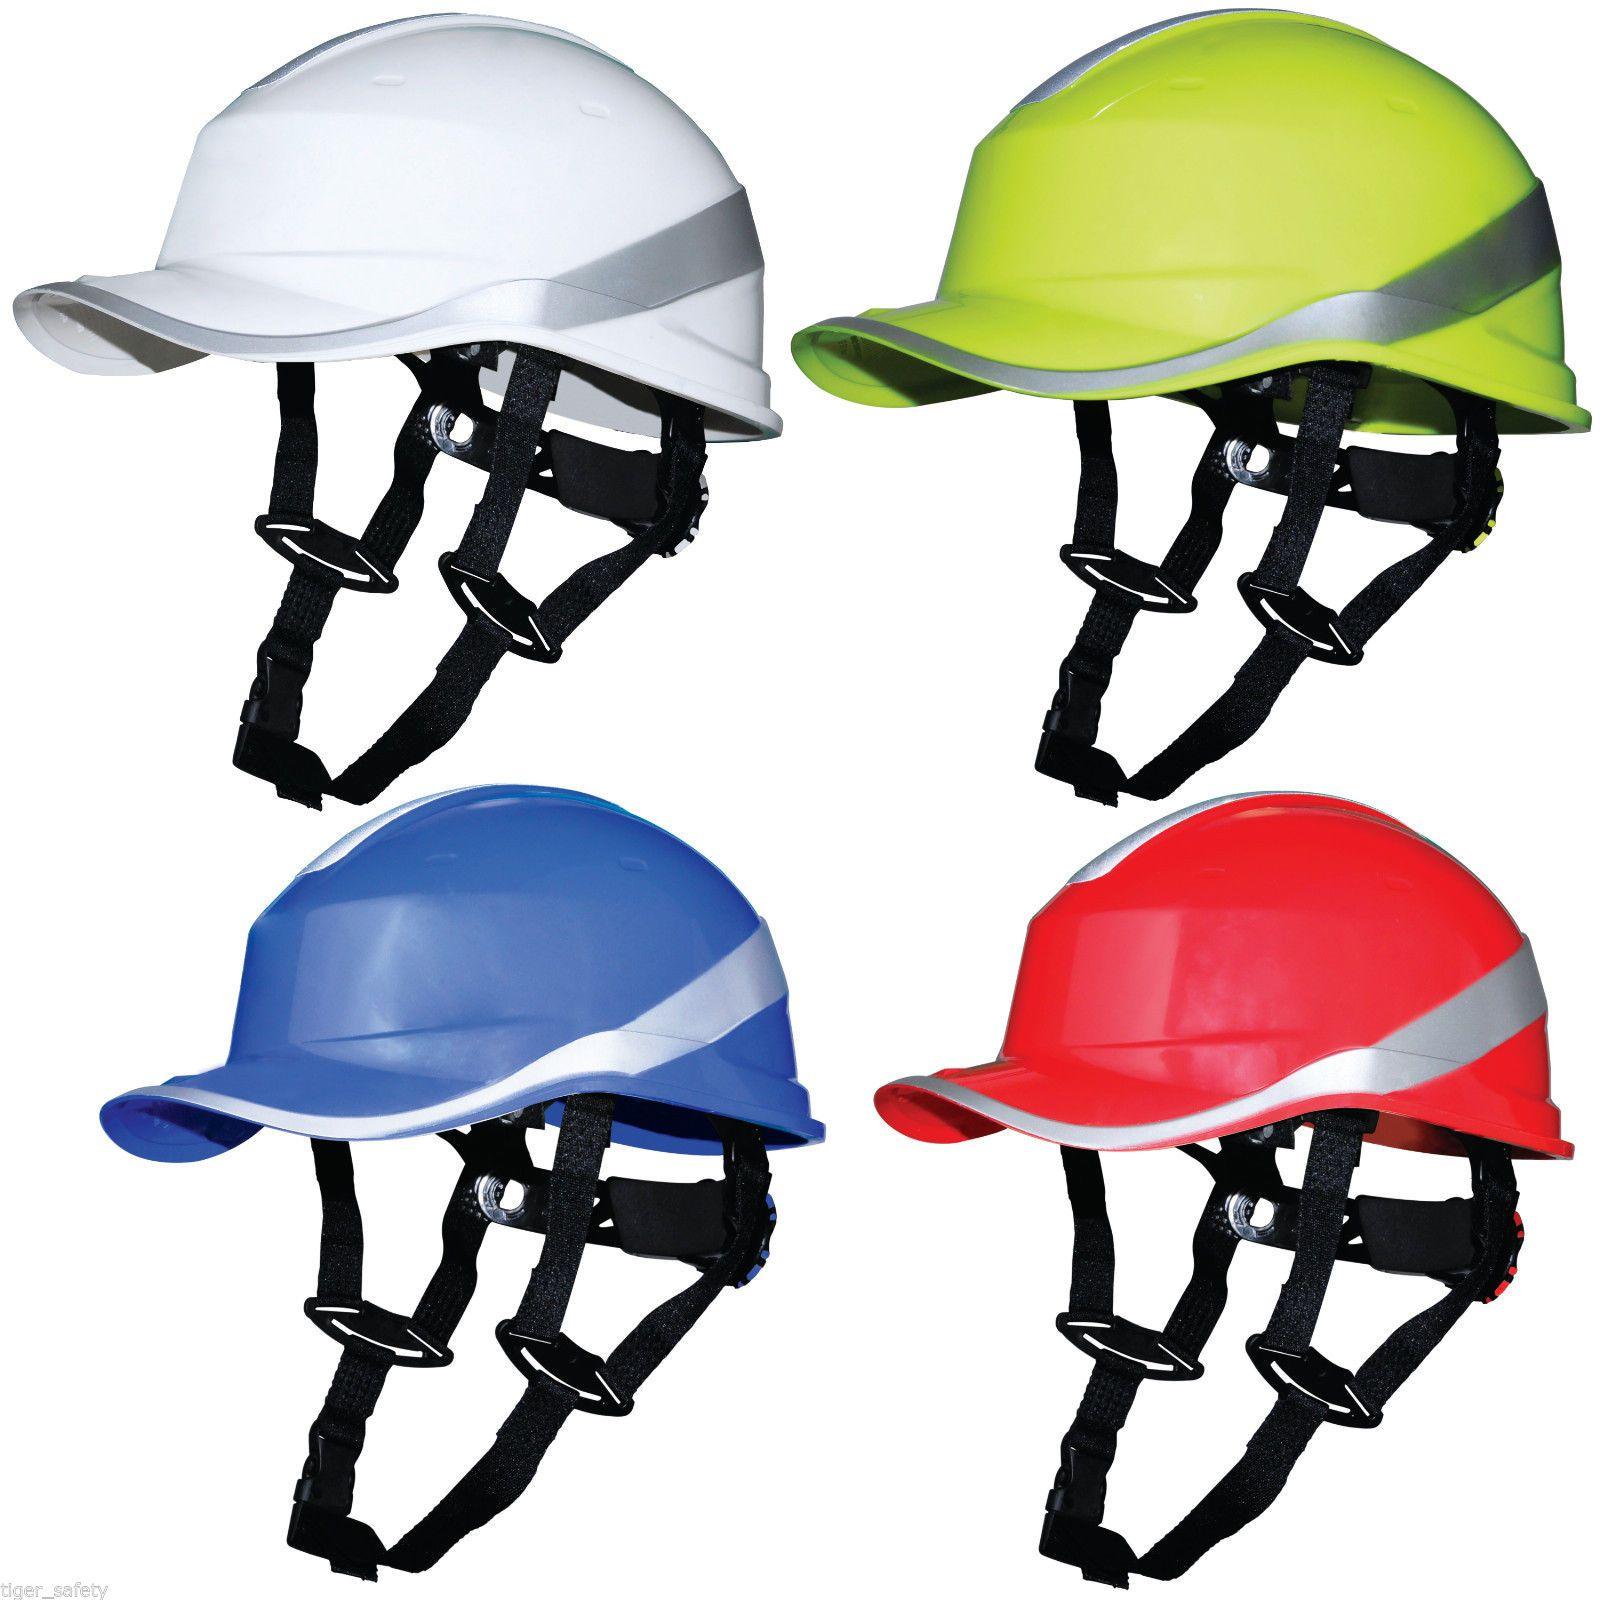 Delta Plus Venitex Baseball Diamond V Up Hard Hat Safety Helmet Bump Cap Ppe View More On The Link Http Www Zeppy Io Pr Helmet Hard Hats Safety Helmet